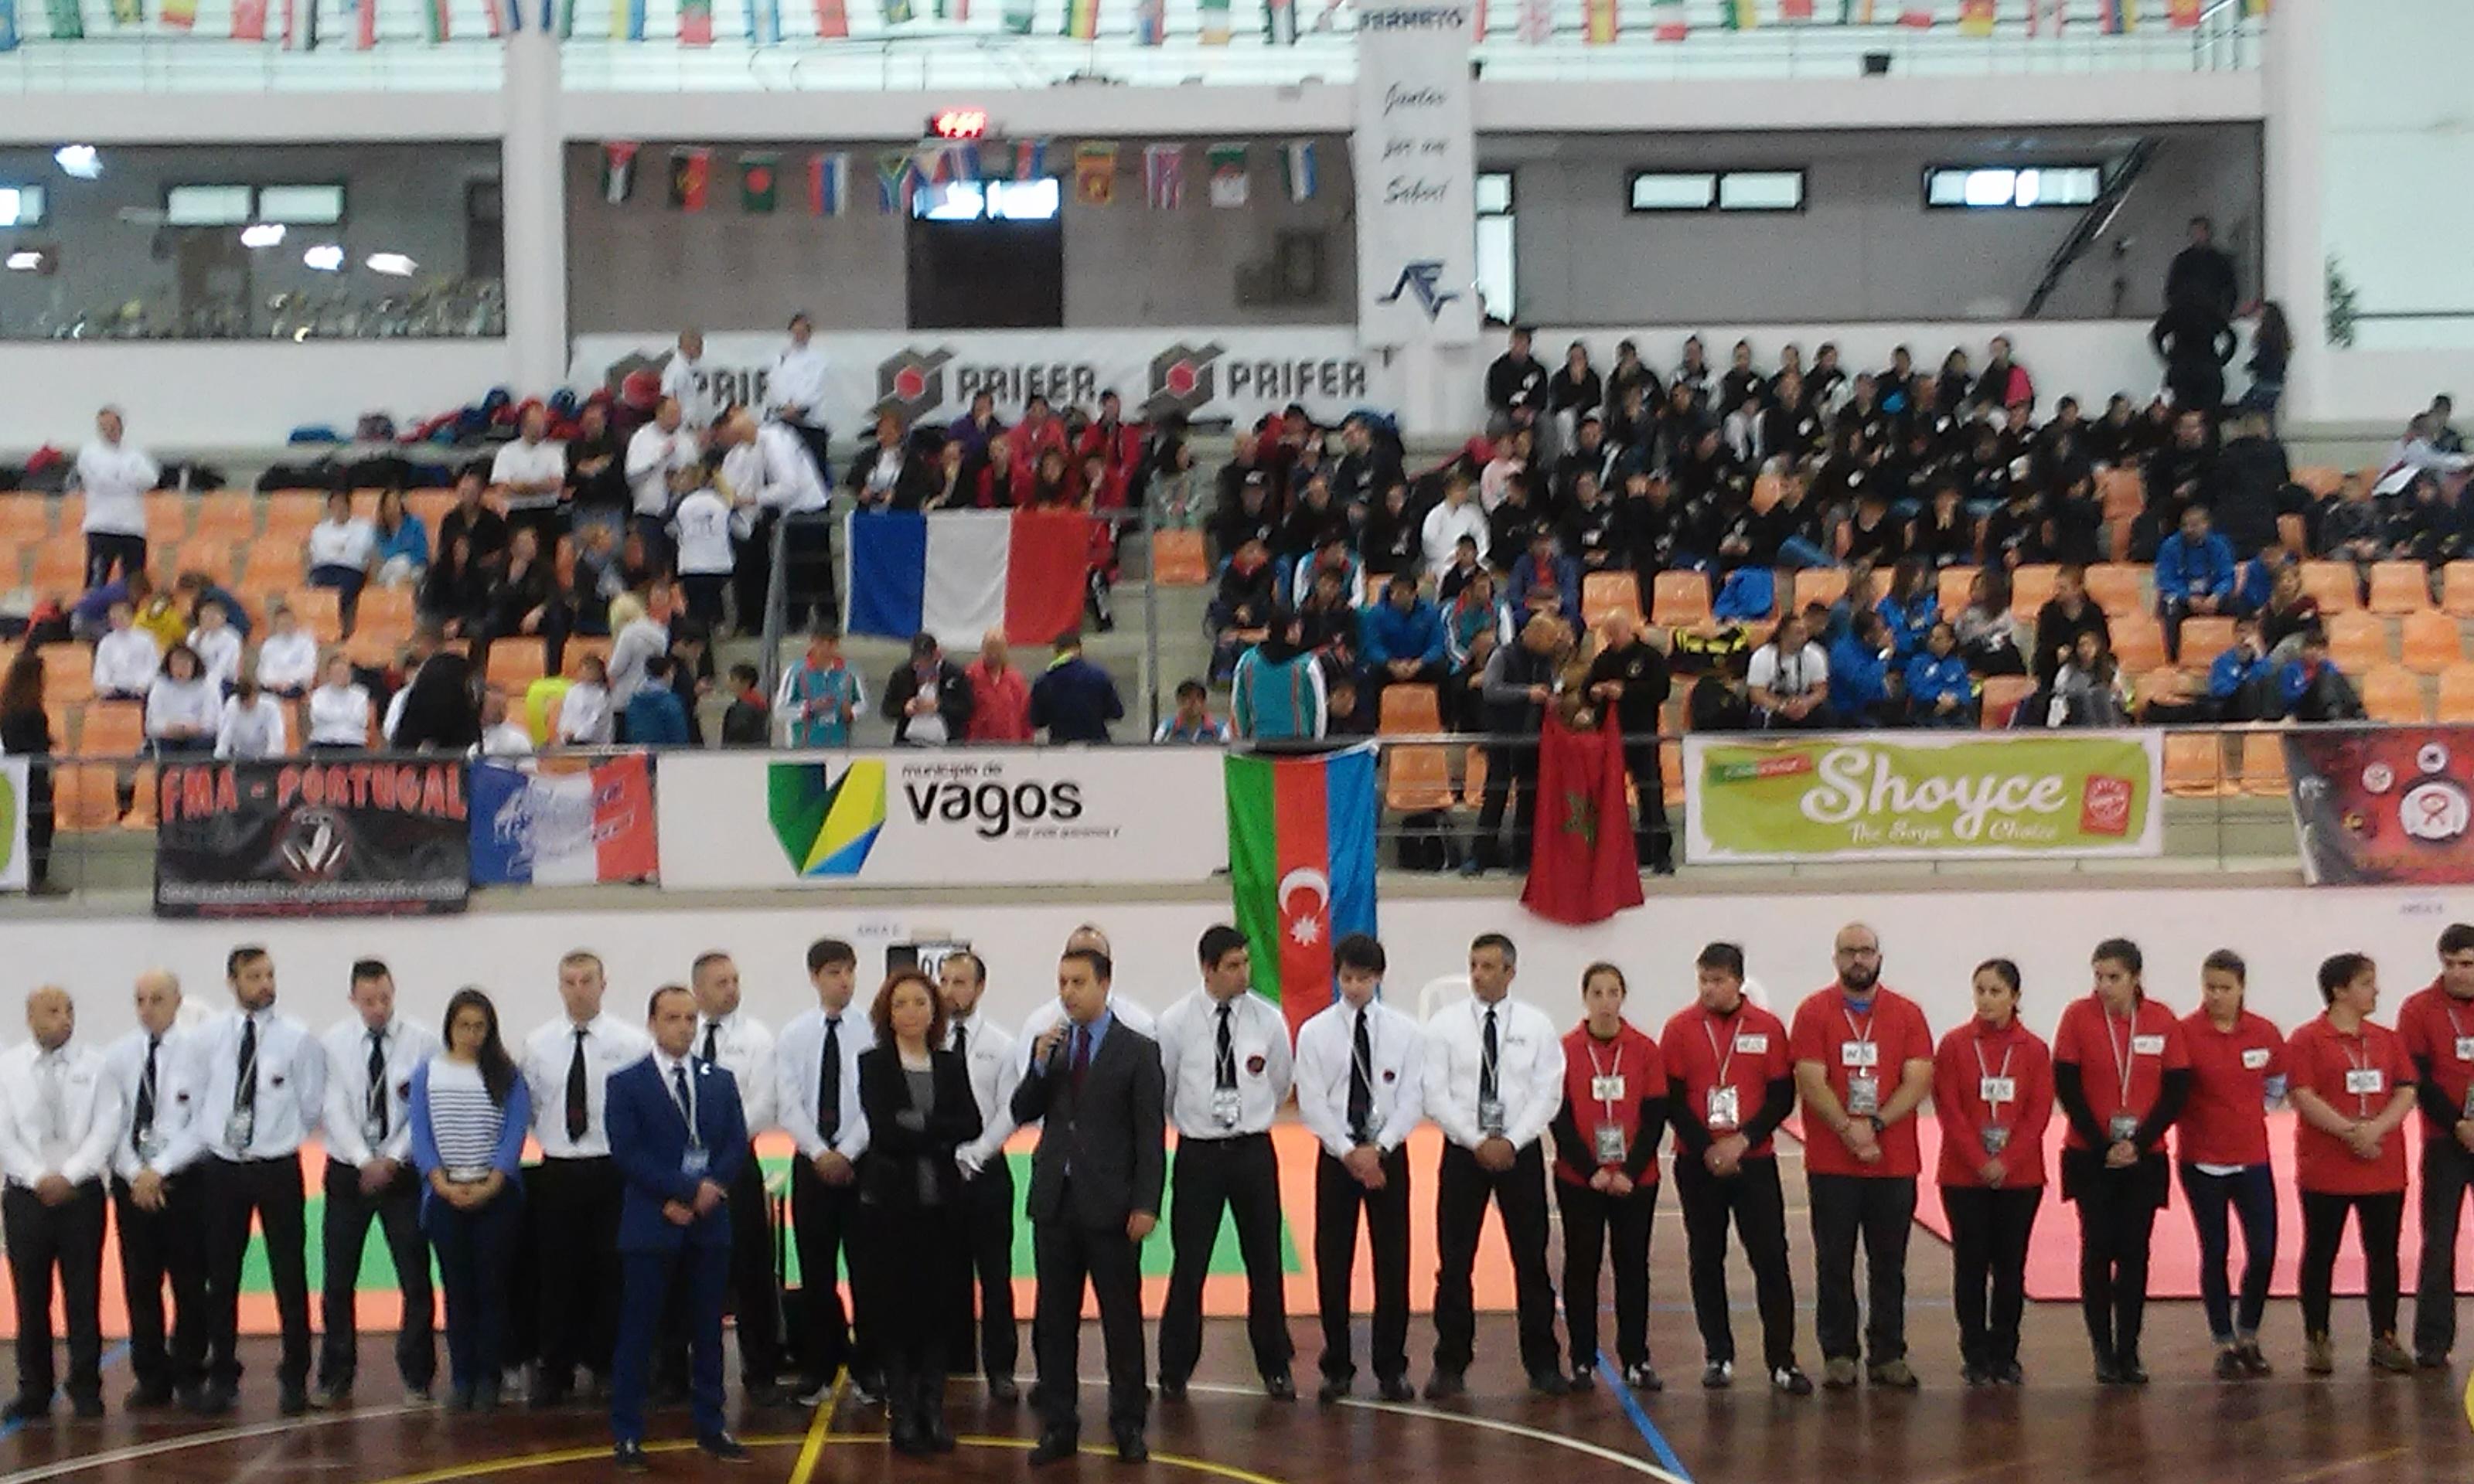 Vagos recebe 5º Campeonato do Mundo de Artes Marciais